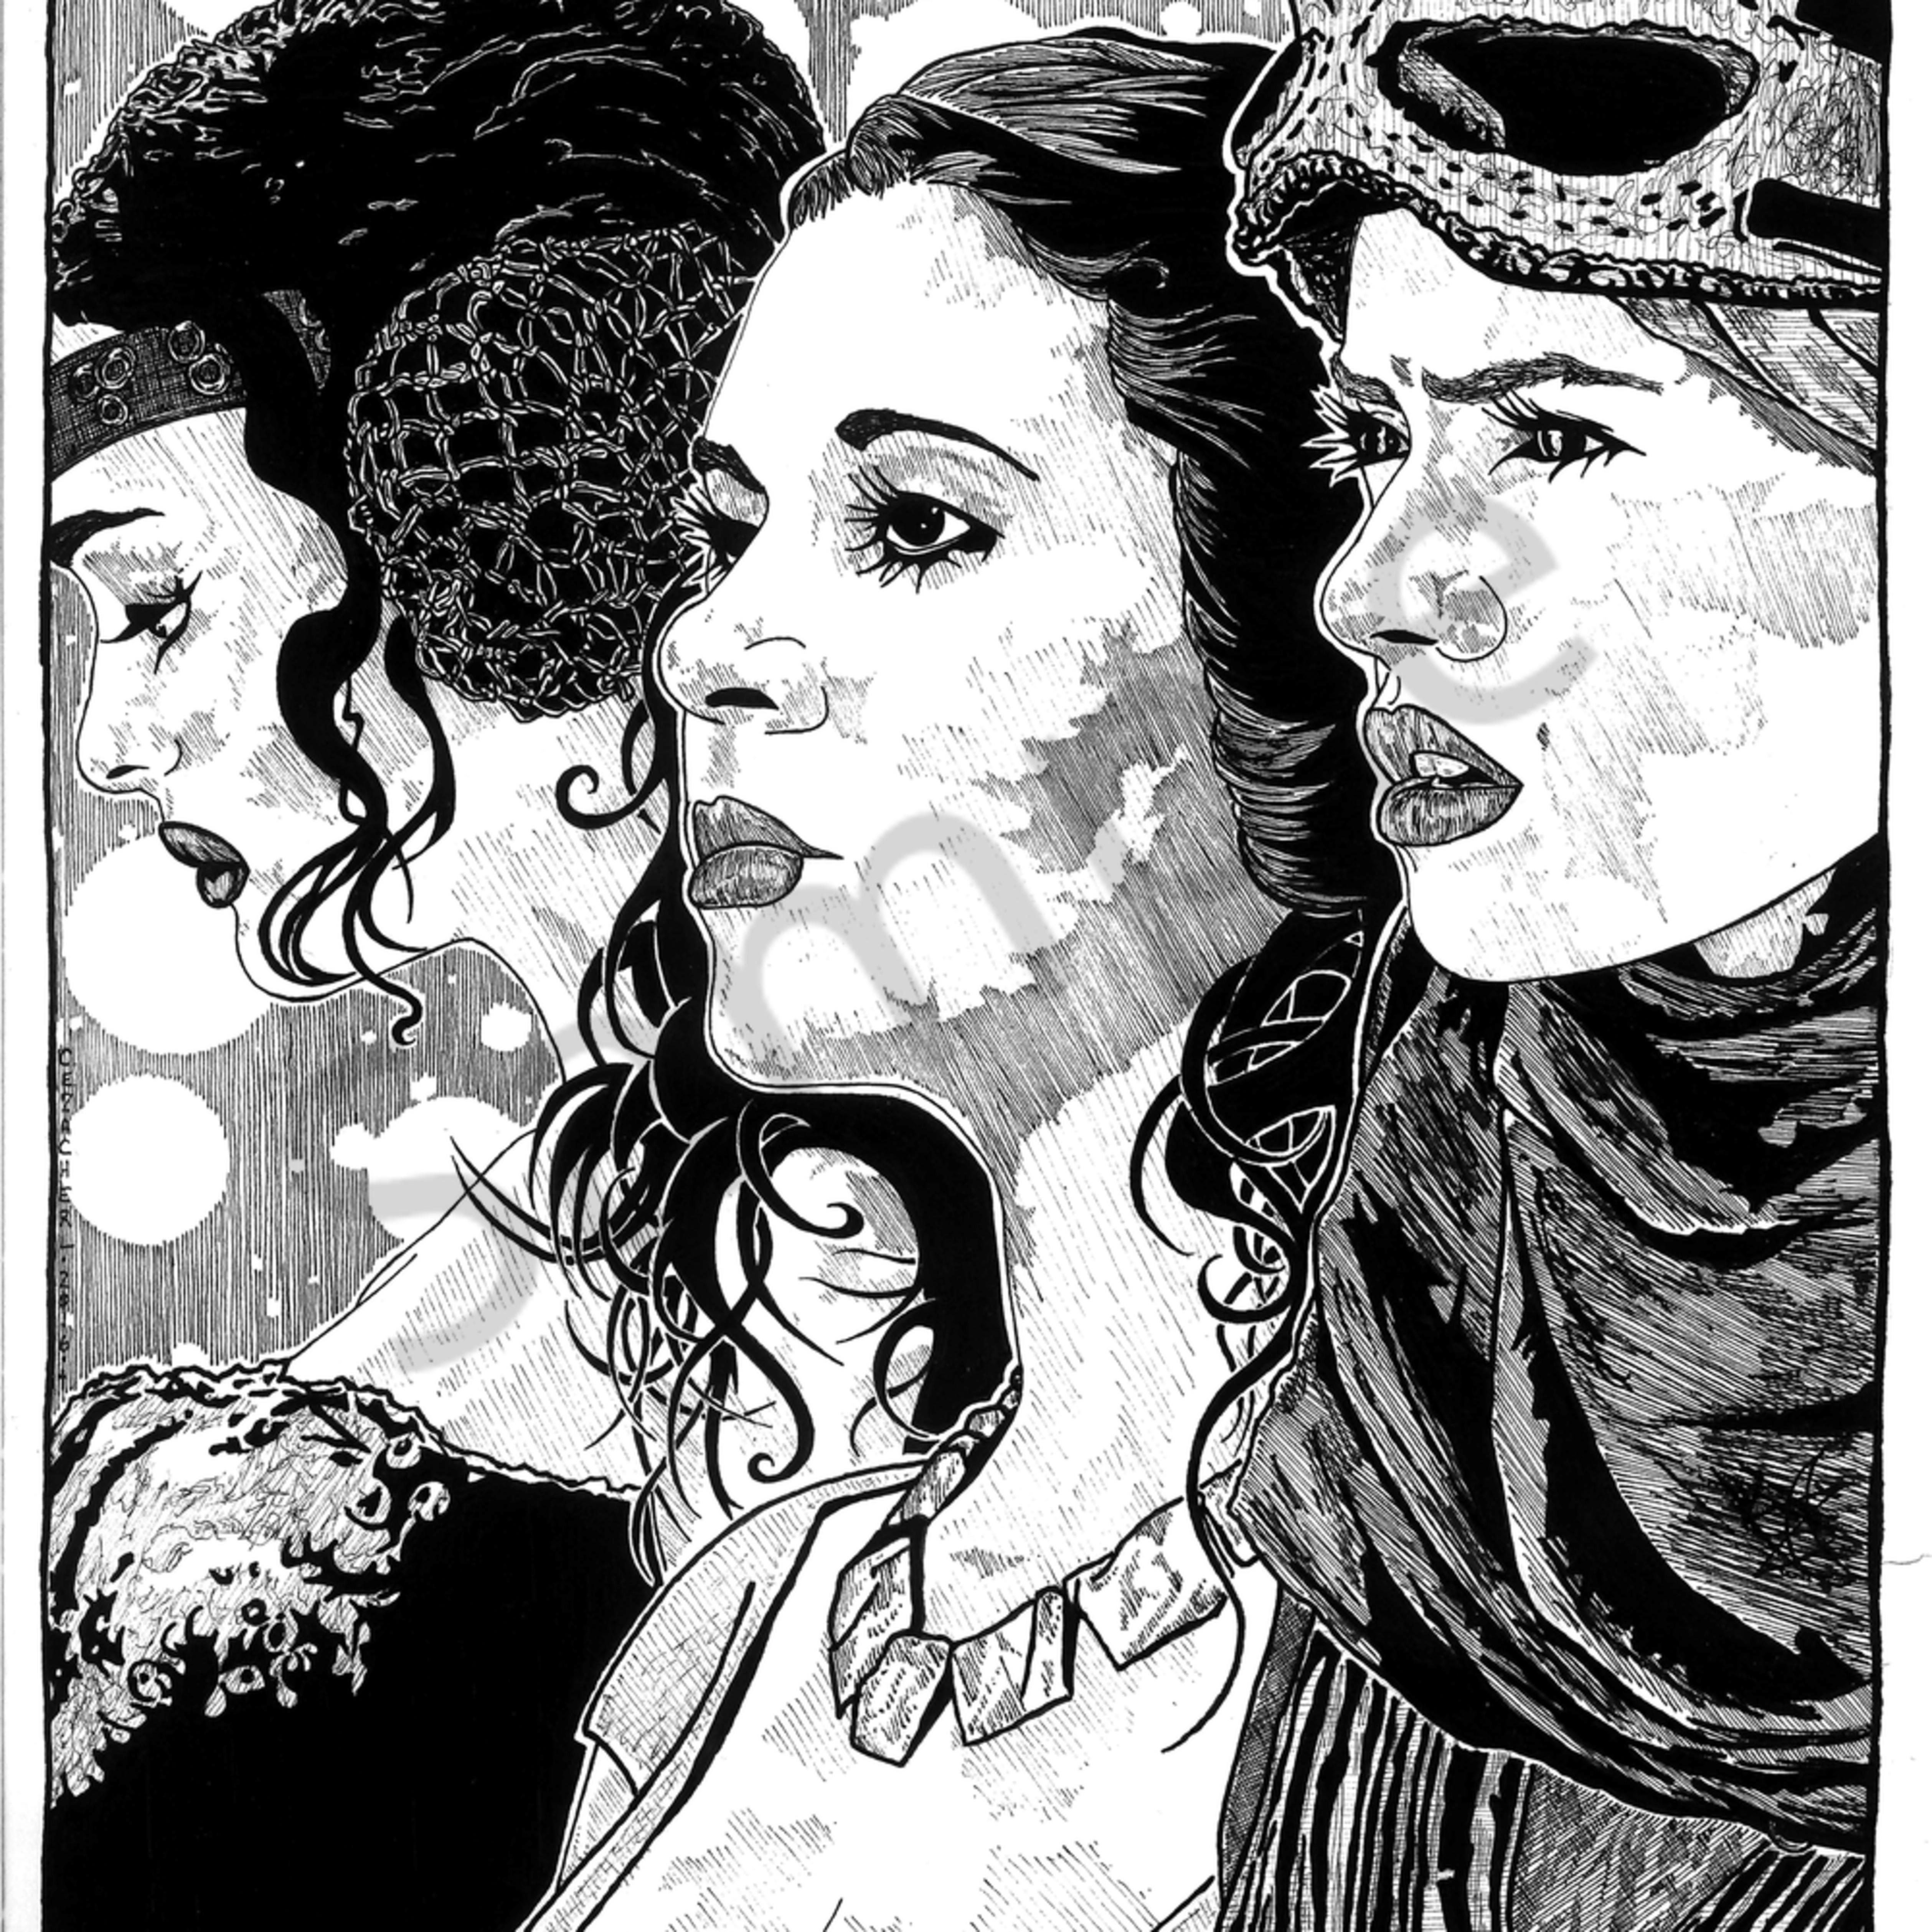 The ladies of star wars by cezacherl dae677c t90la9